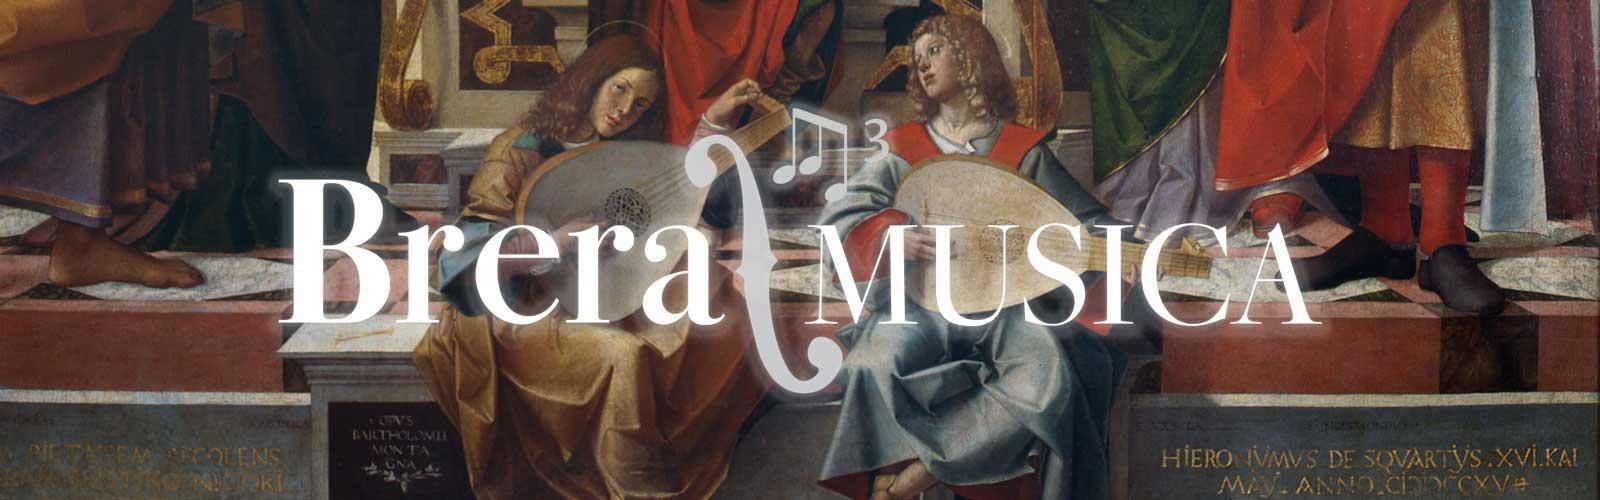 Brera/Musica si fa in <strong>3</strong>